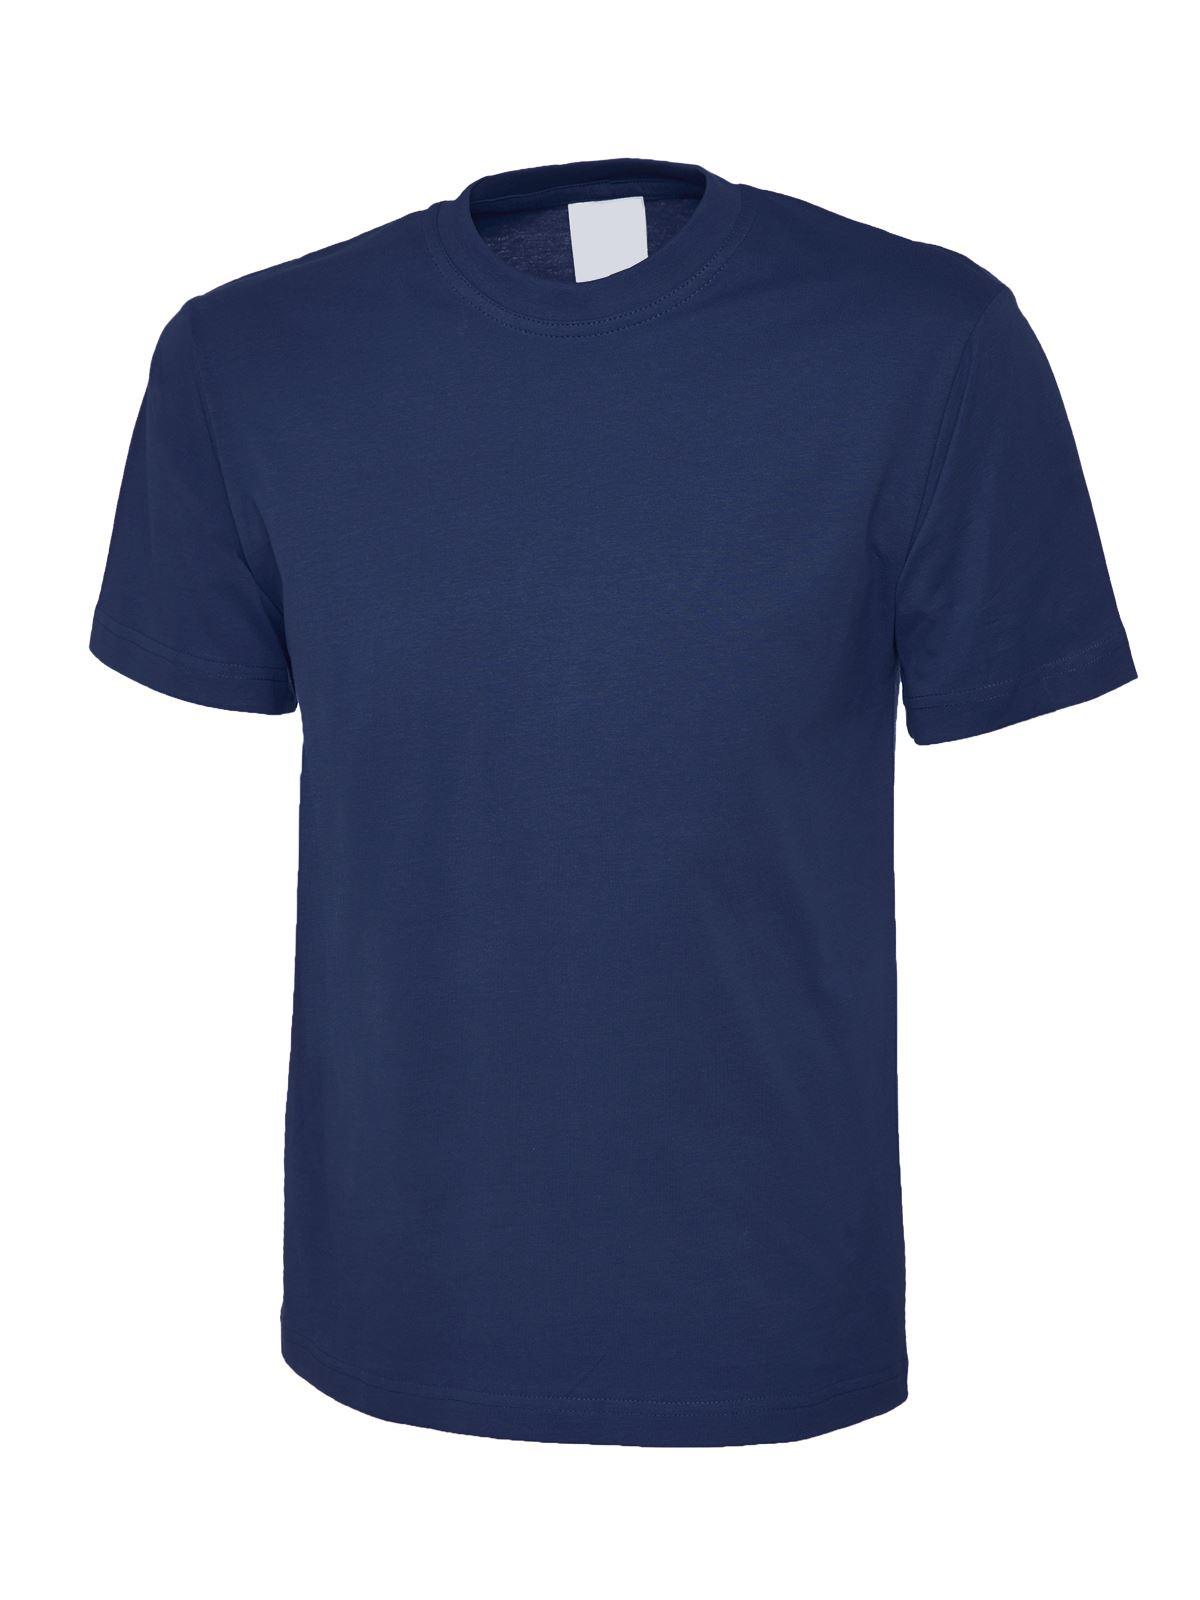 Mens womens classic plain t shirt tshirt short sleeve for Plain t shirt wholesale philippines